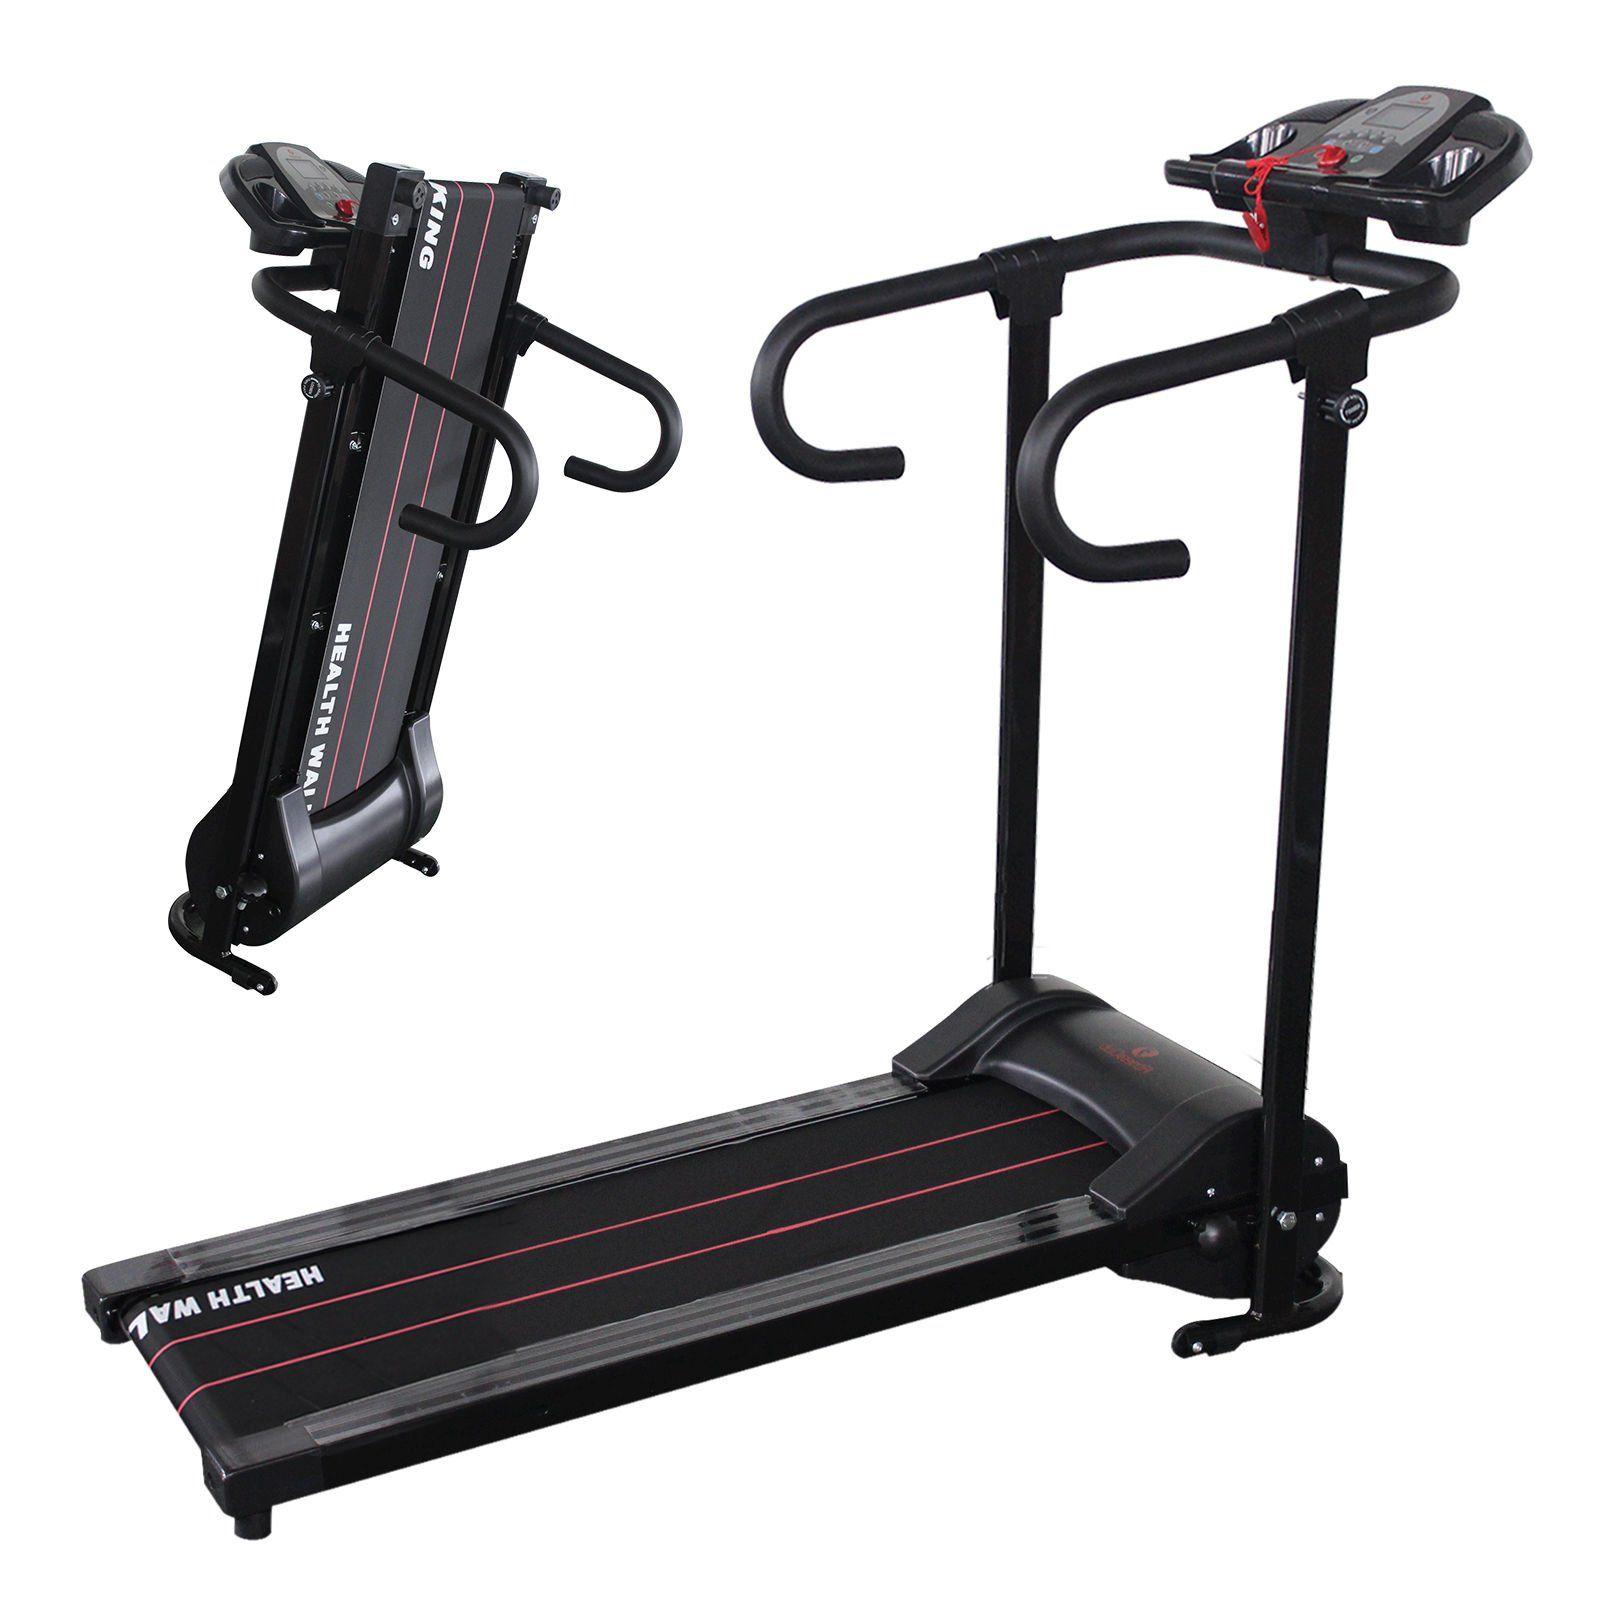 Portable 500W Folding Electric Motorized Treadmill Running ...